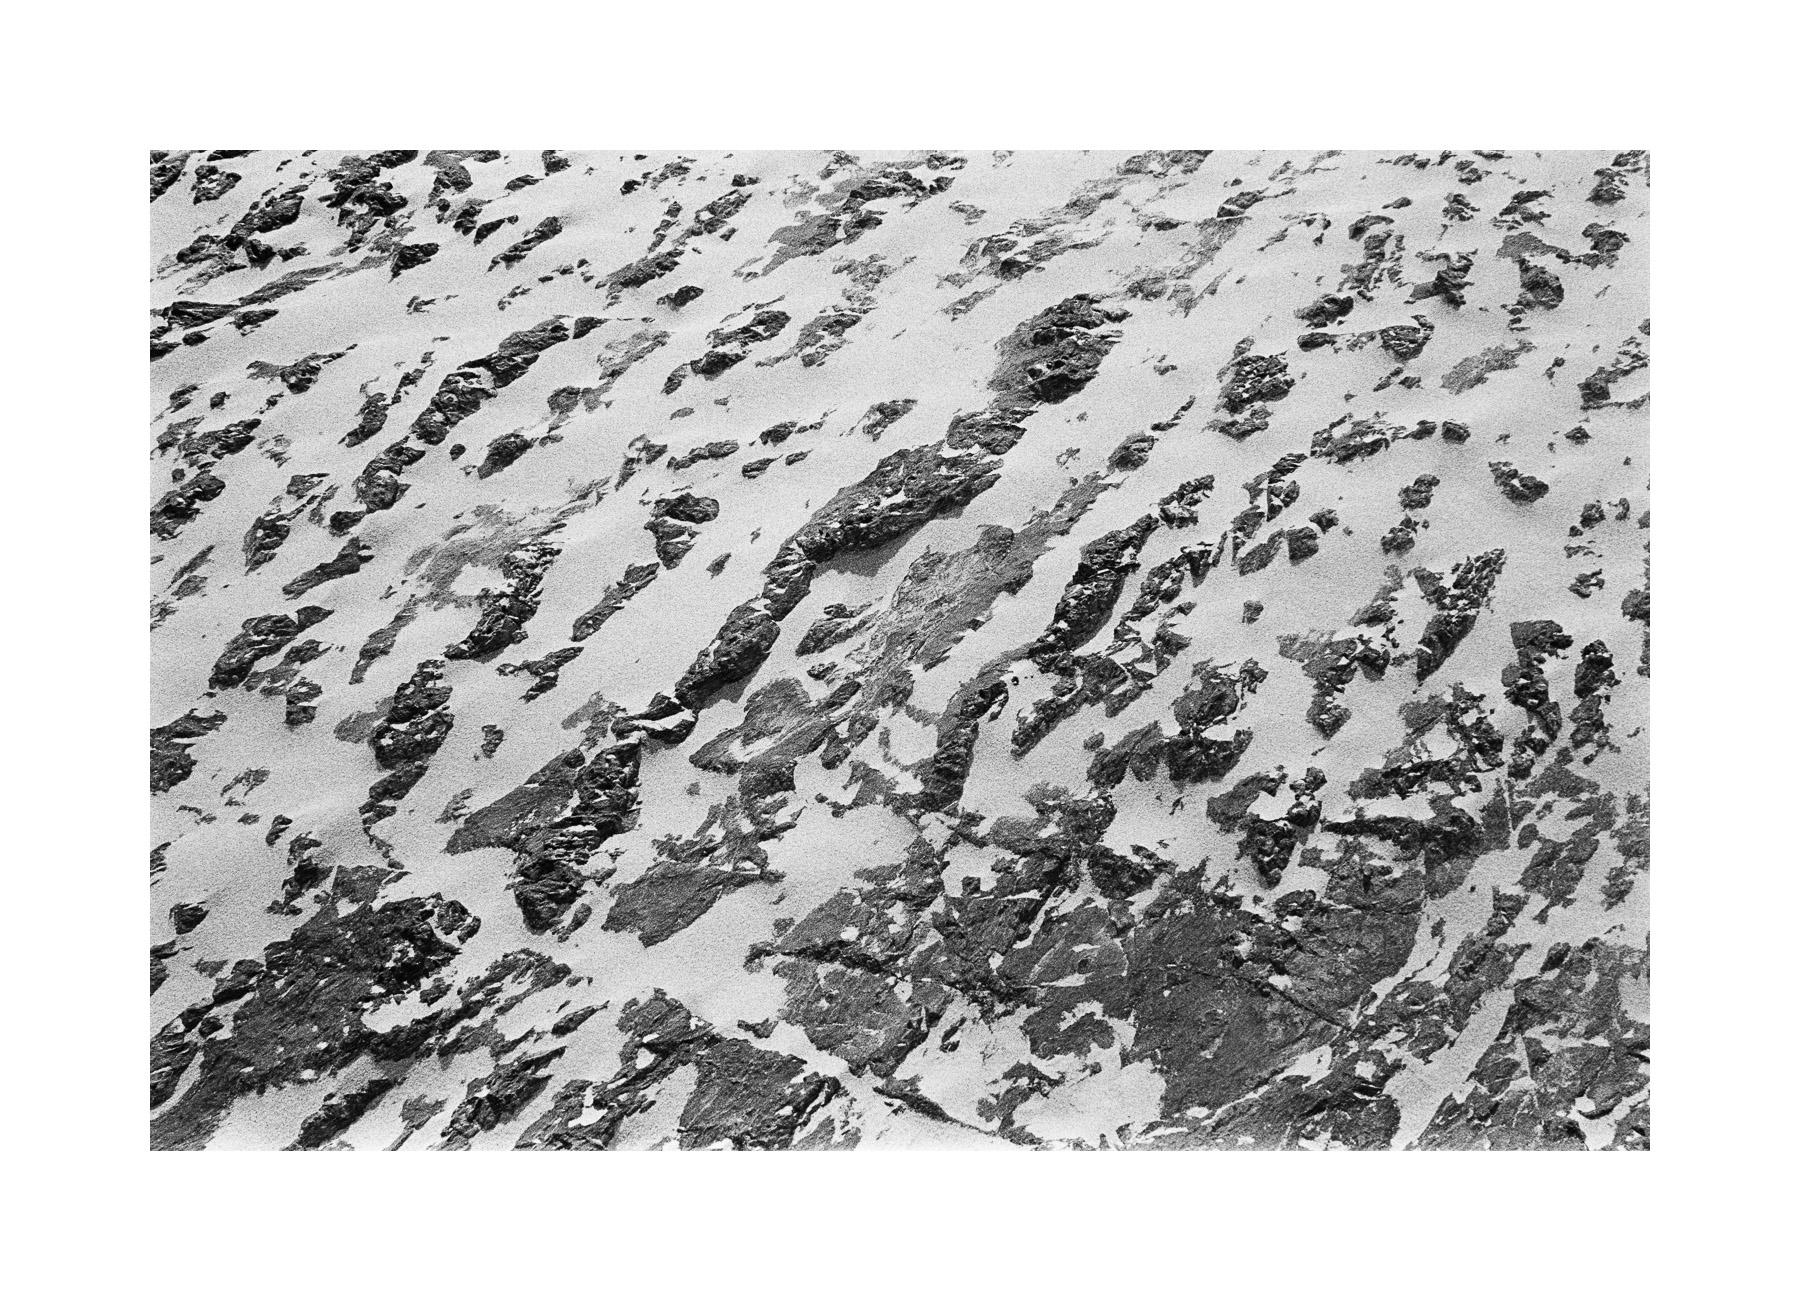 20181103 - Roll 263 - 022-Nick-Bedford,-Photographer-Black and White, Currumbin Rocks, Kodak TRI-X 400, Leica M7, Seascape, Voigtlander 35mm F1.7.jpg